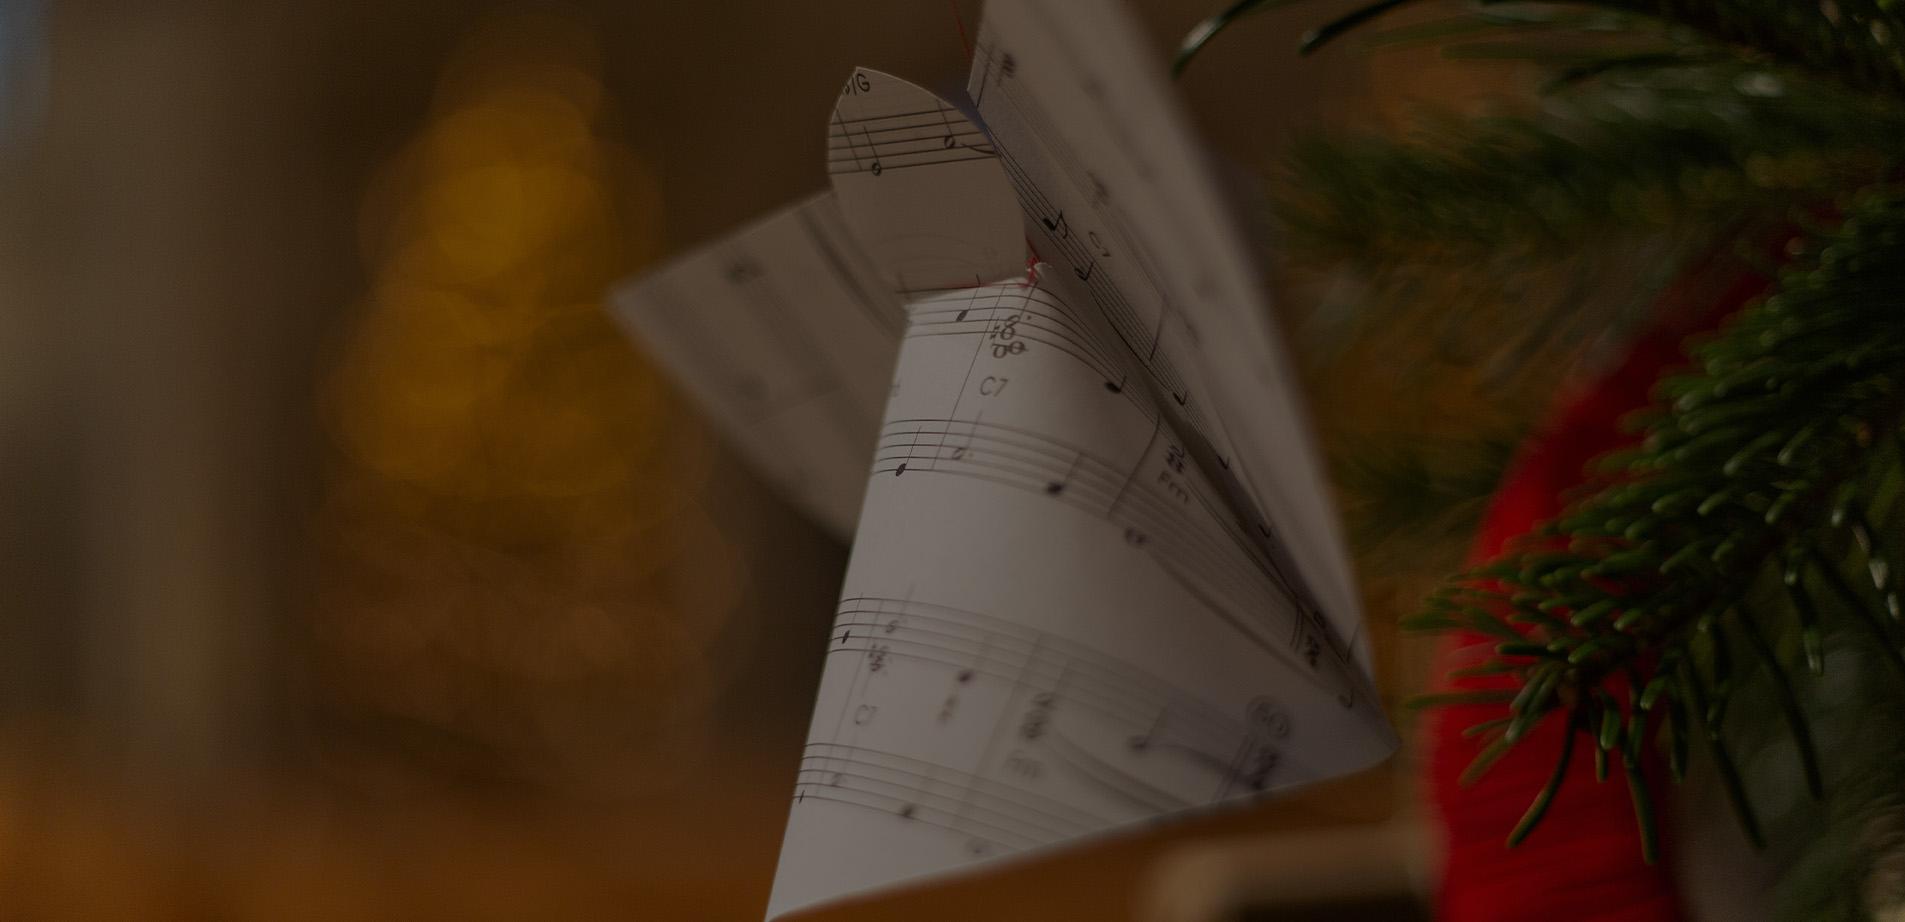 Evensong with Carols for Christmas